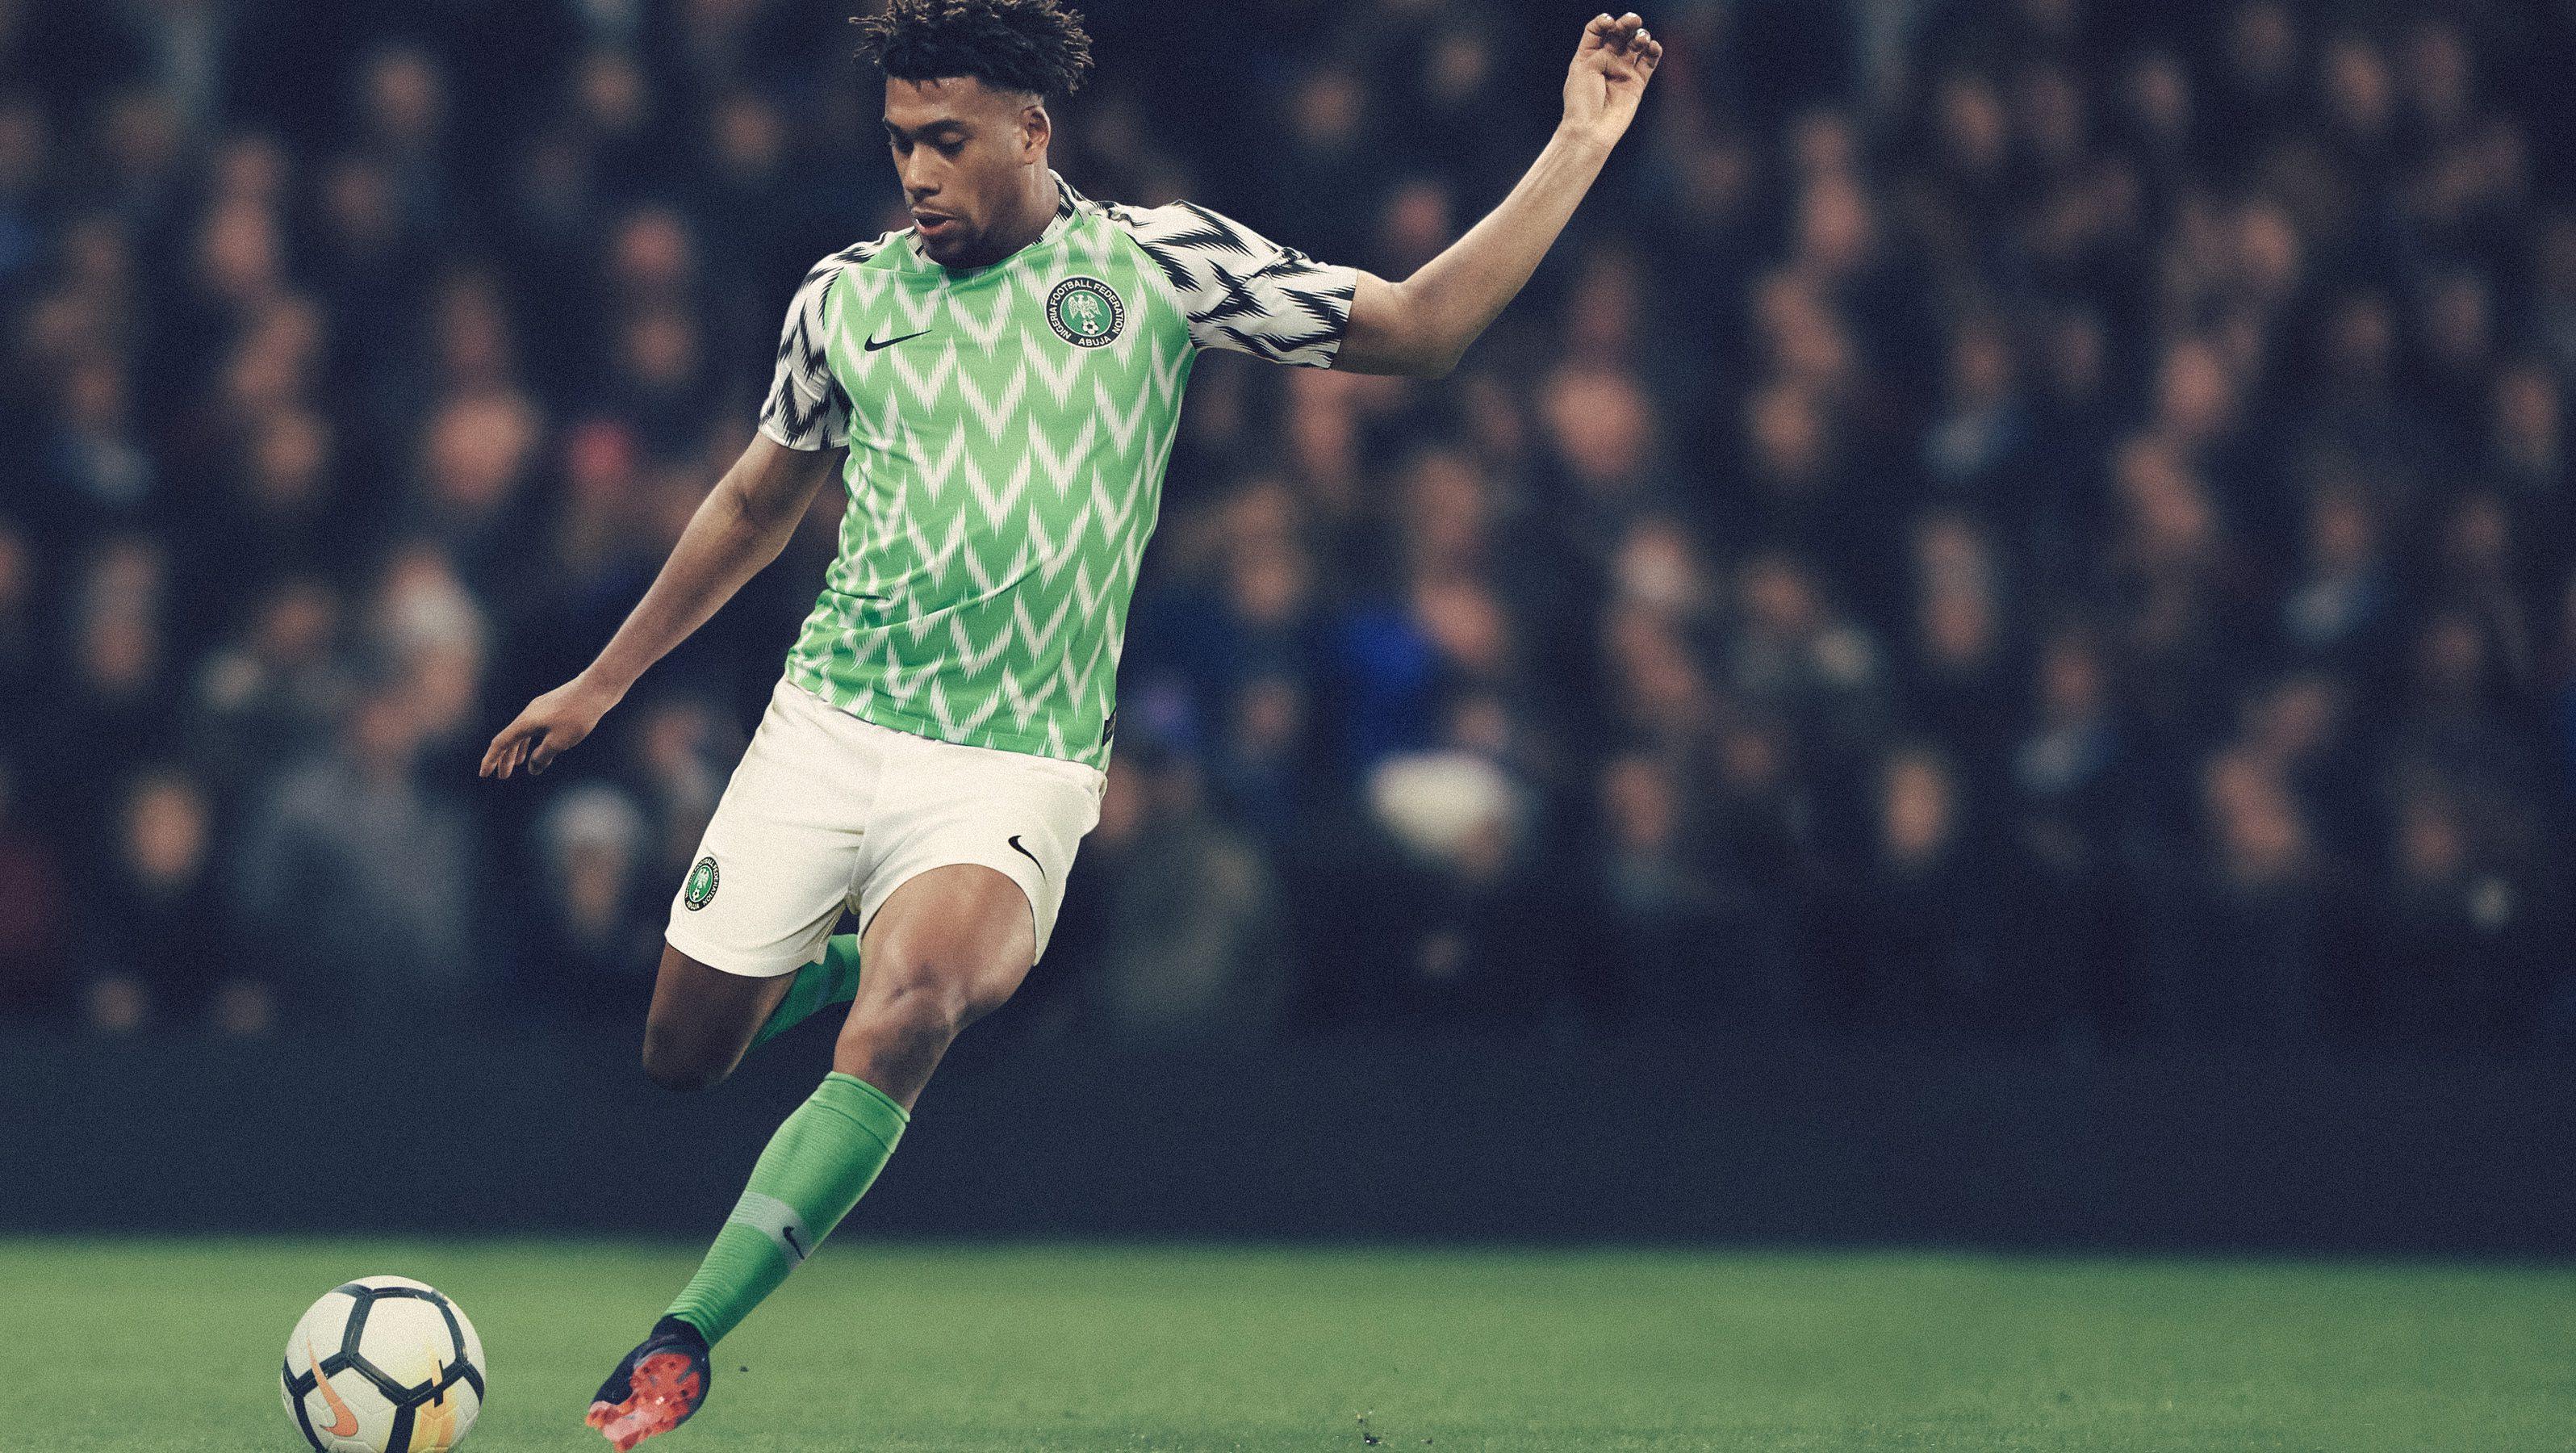 d862e6cf71a Nigeria Super Eagles World Cup kit by Nike is a hit — Quartz Africa